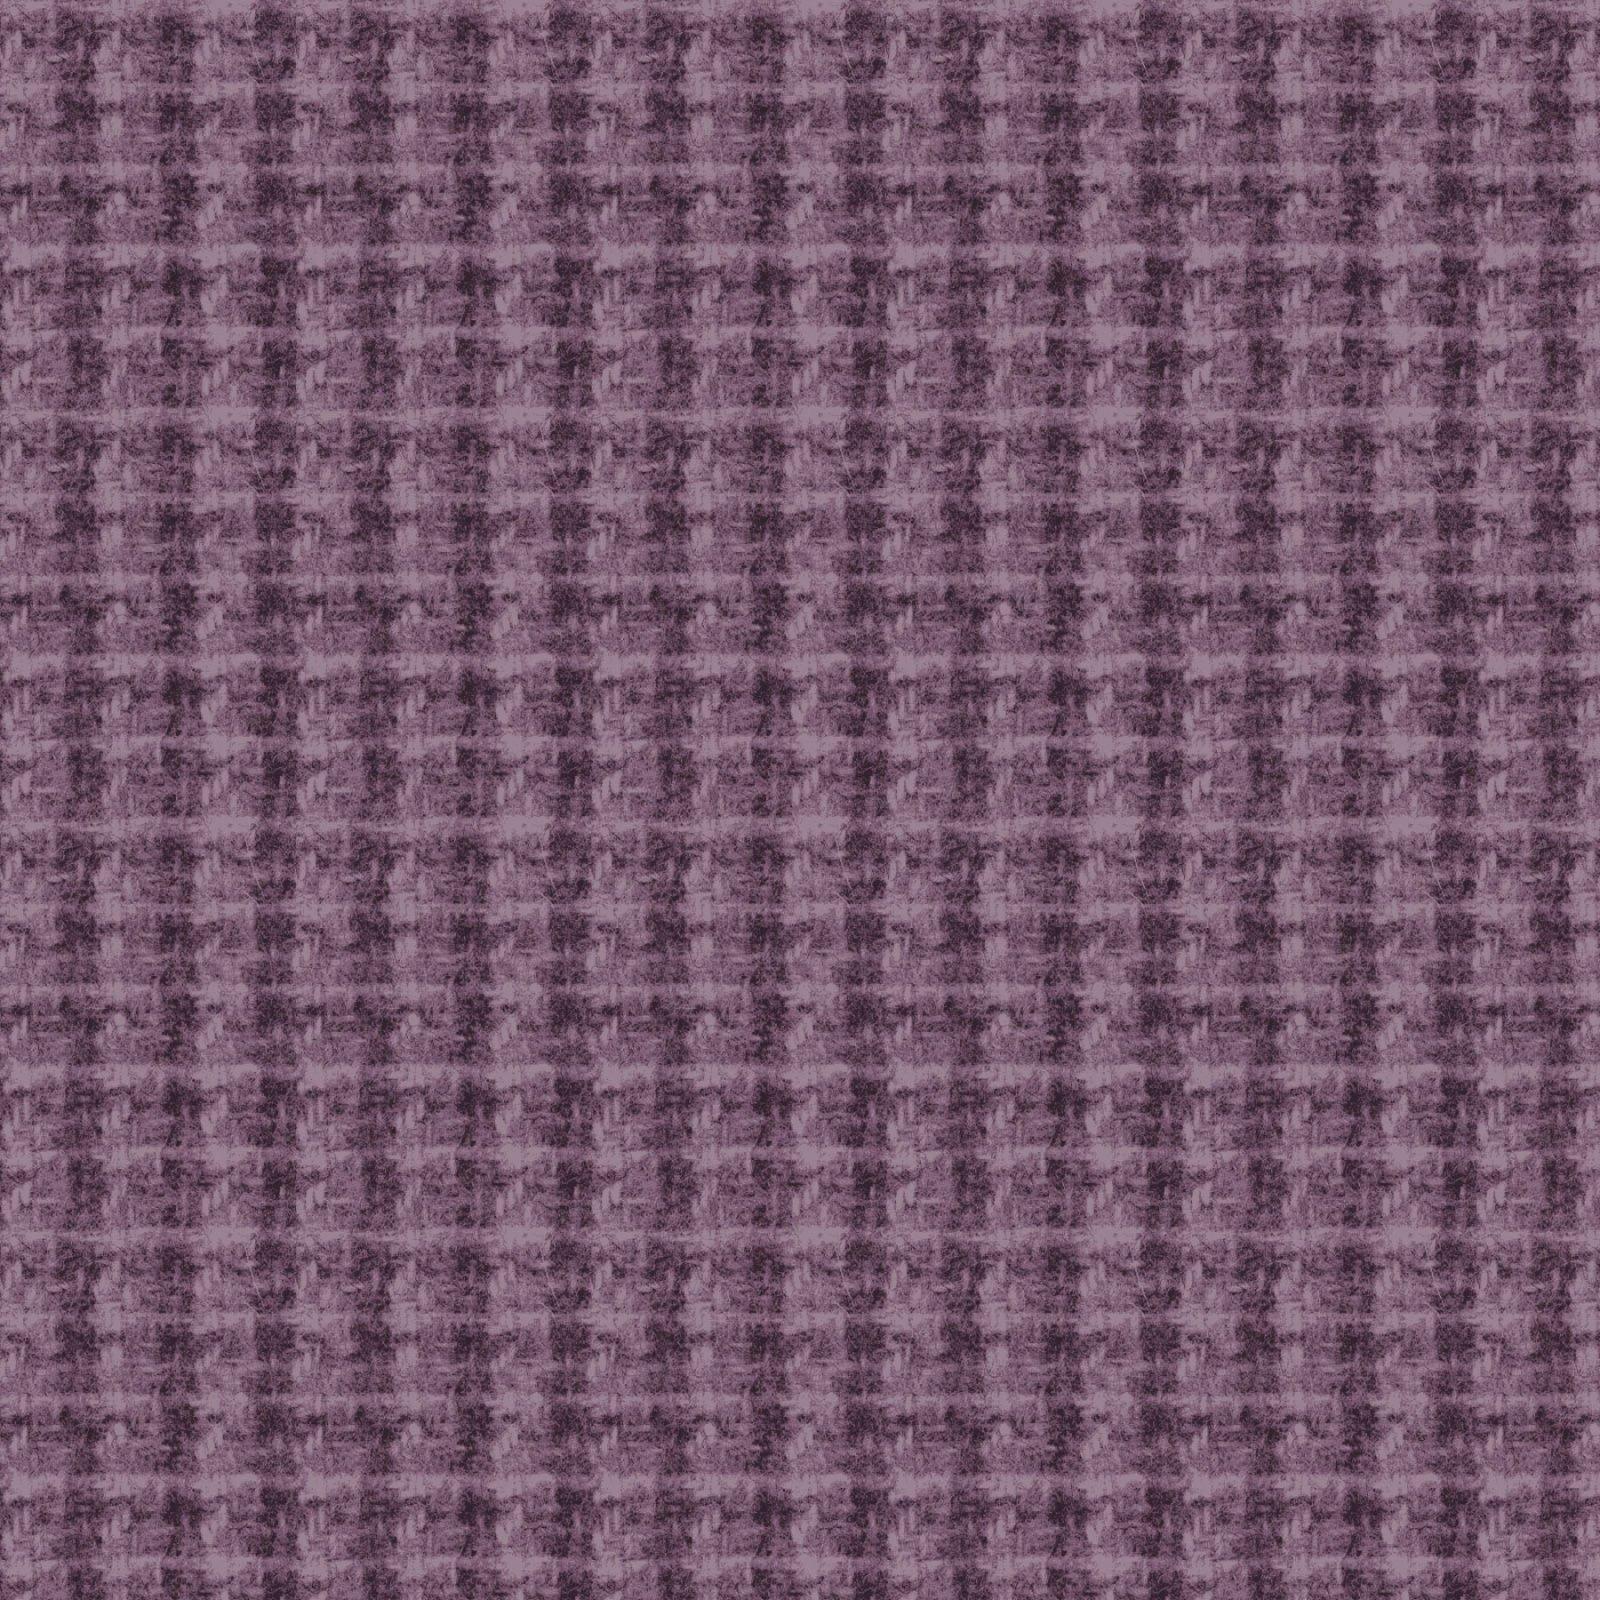 Woolies Flannel F18504-VR